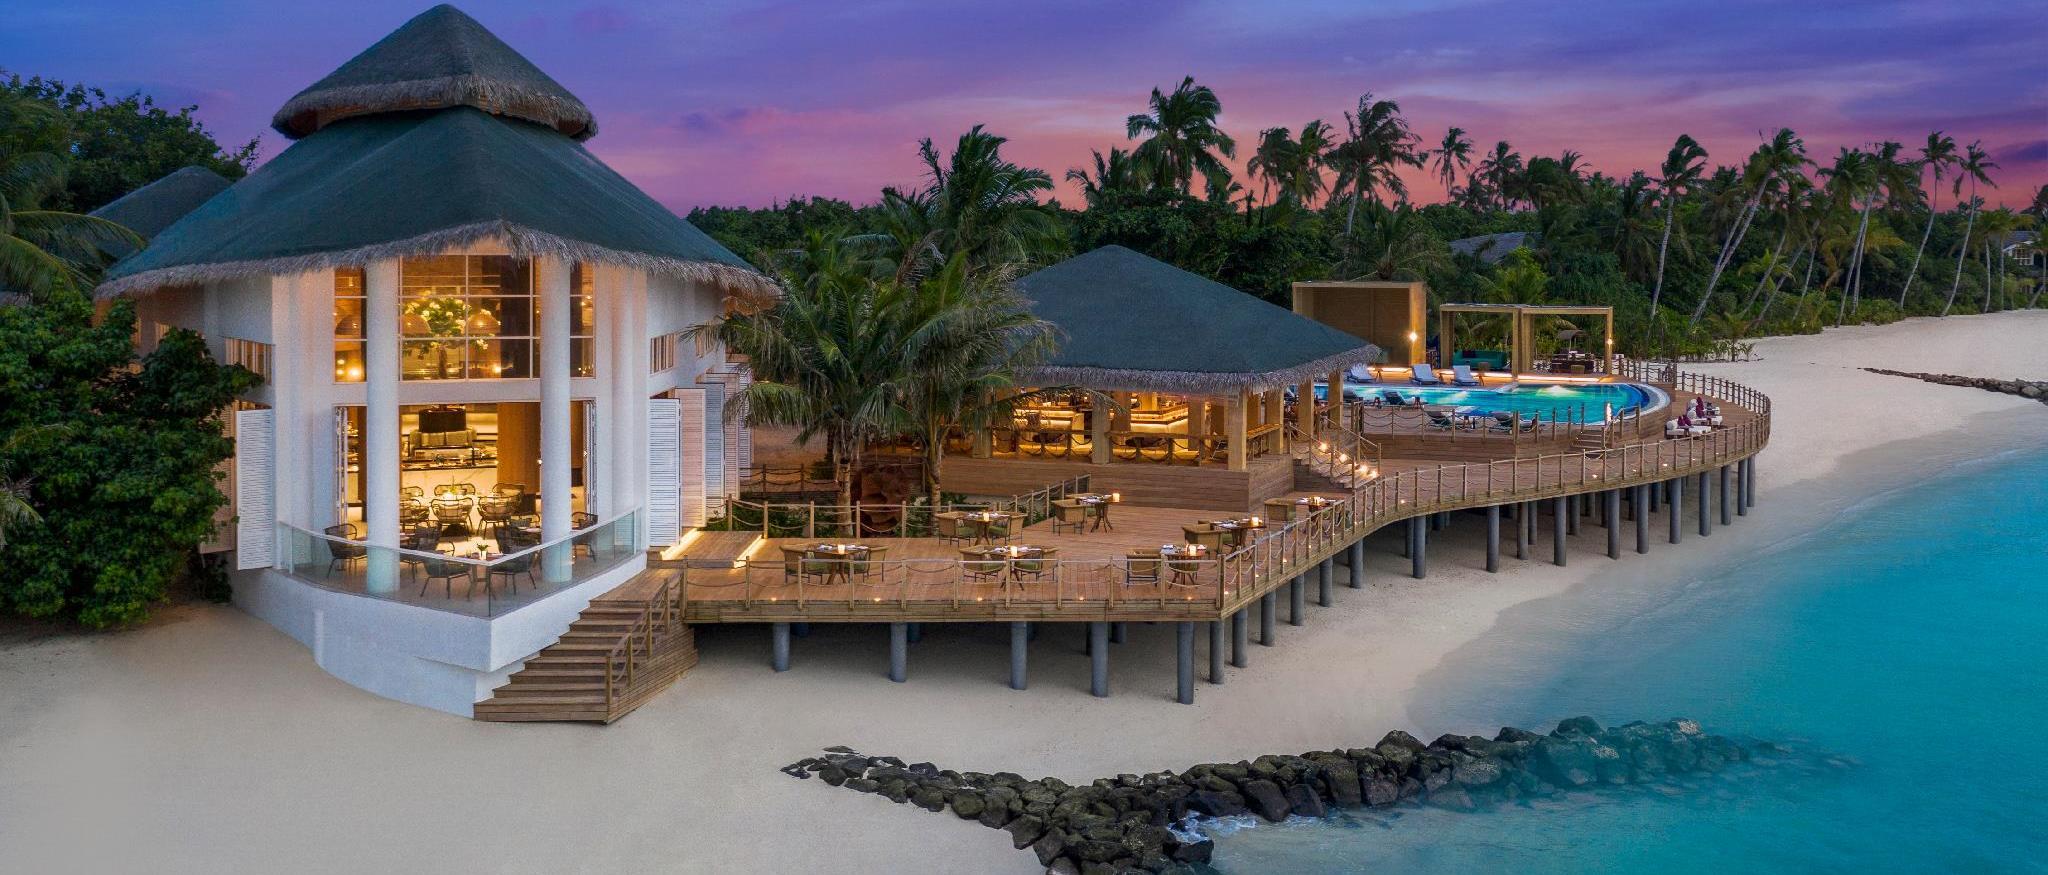 Jw Marriott Maldives Image